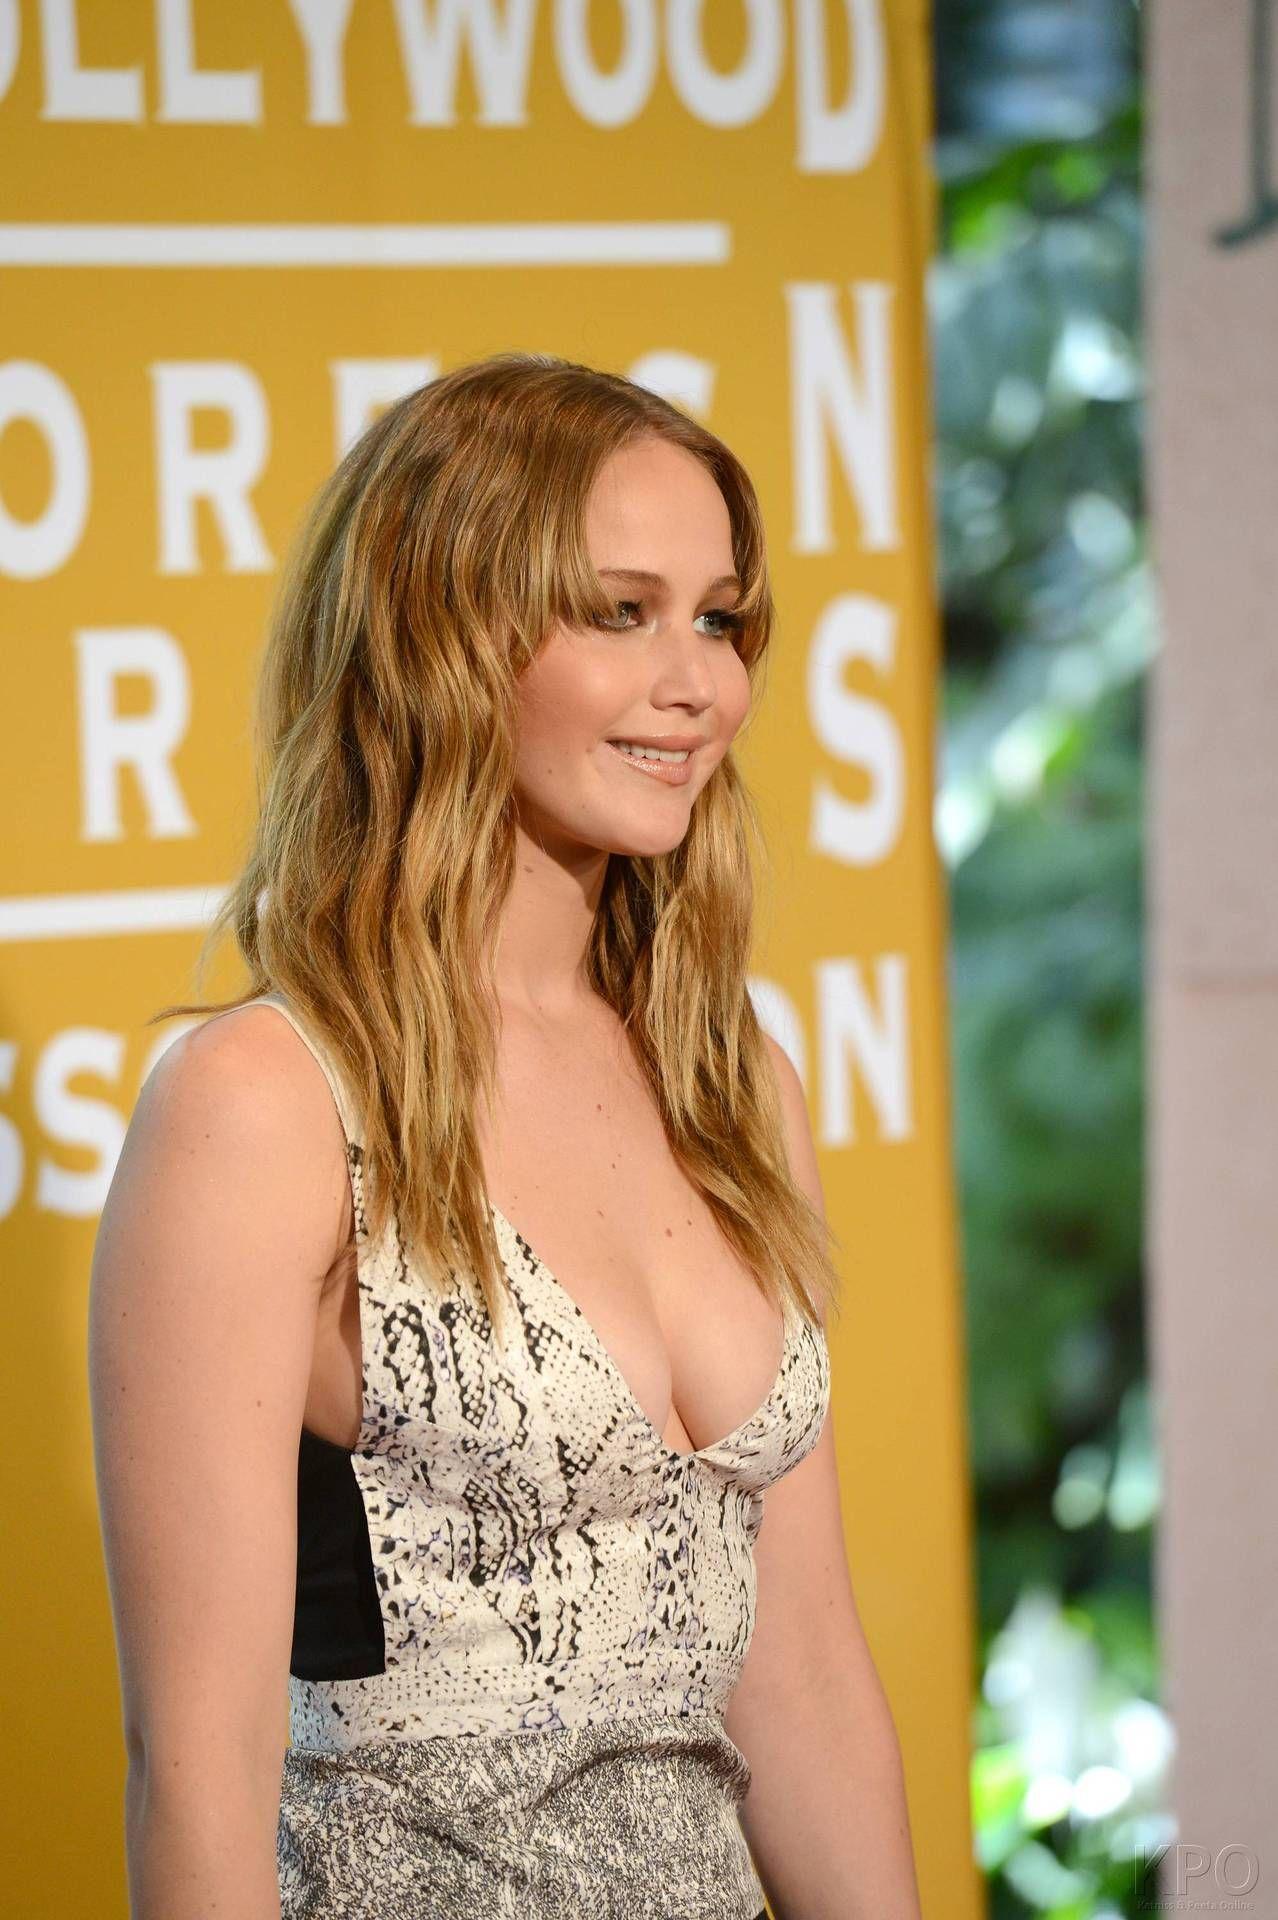 Cheeky Side Boob. #JenniferLawrence #JLaw #HungerGames